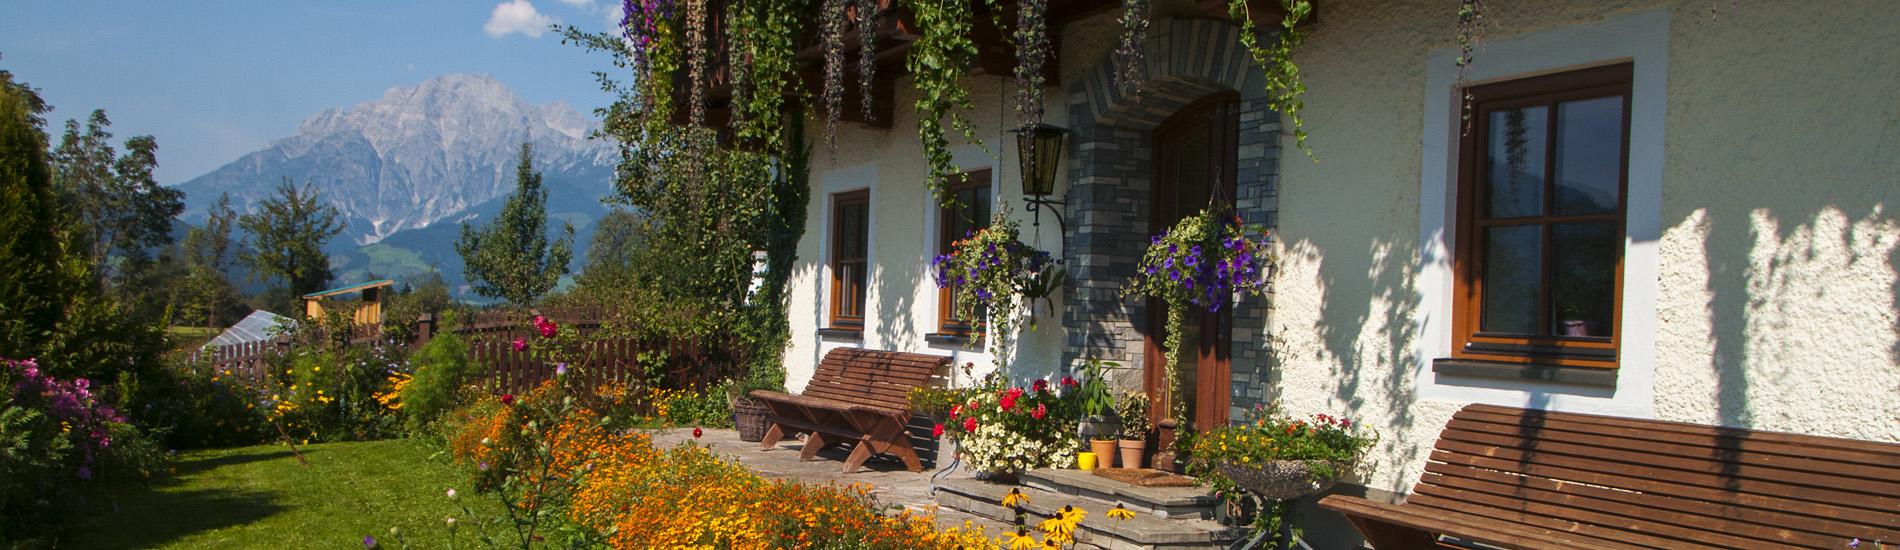 Wonderful Beautiful Austria